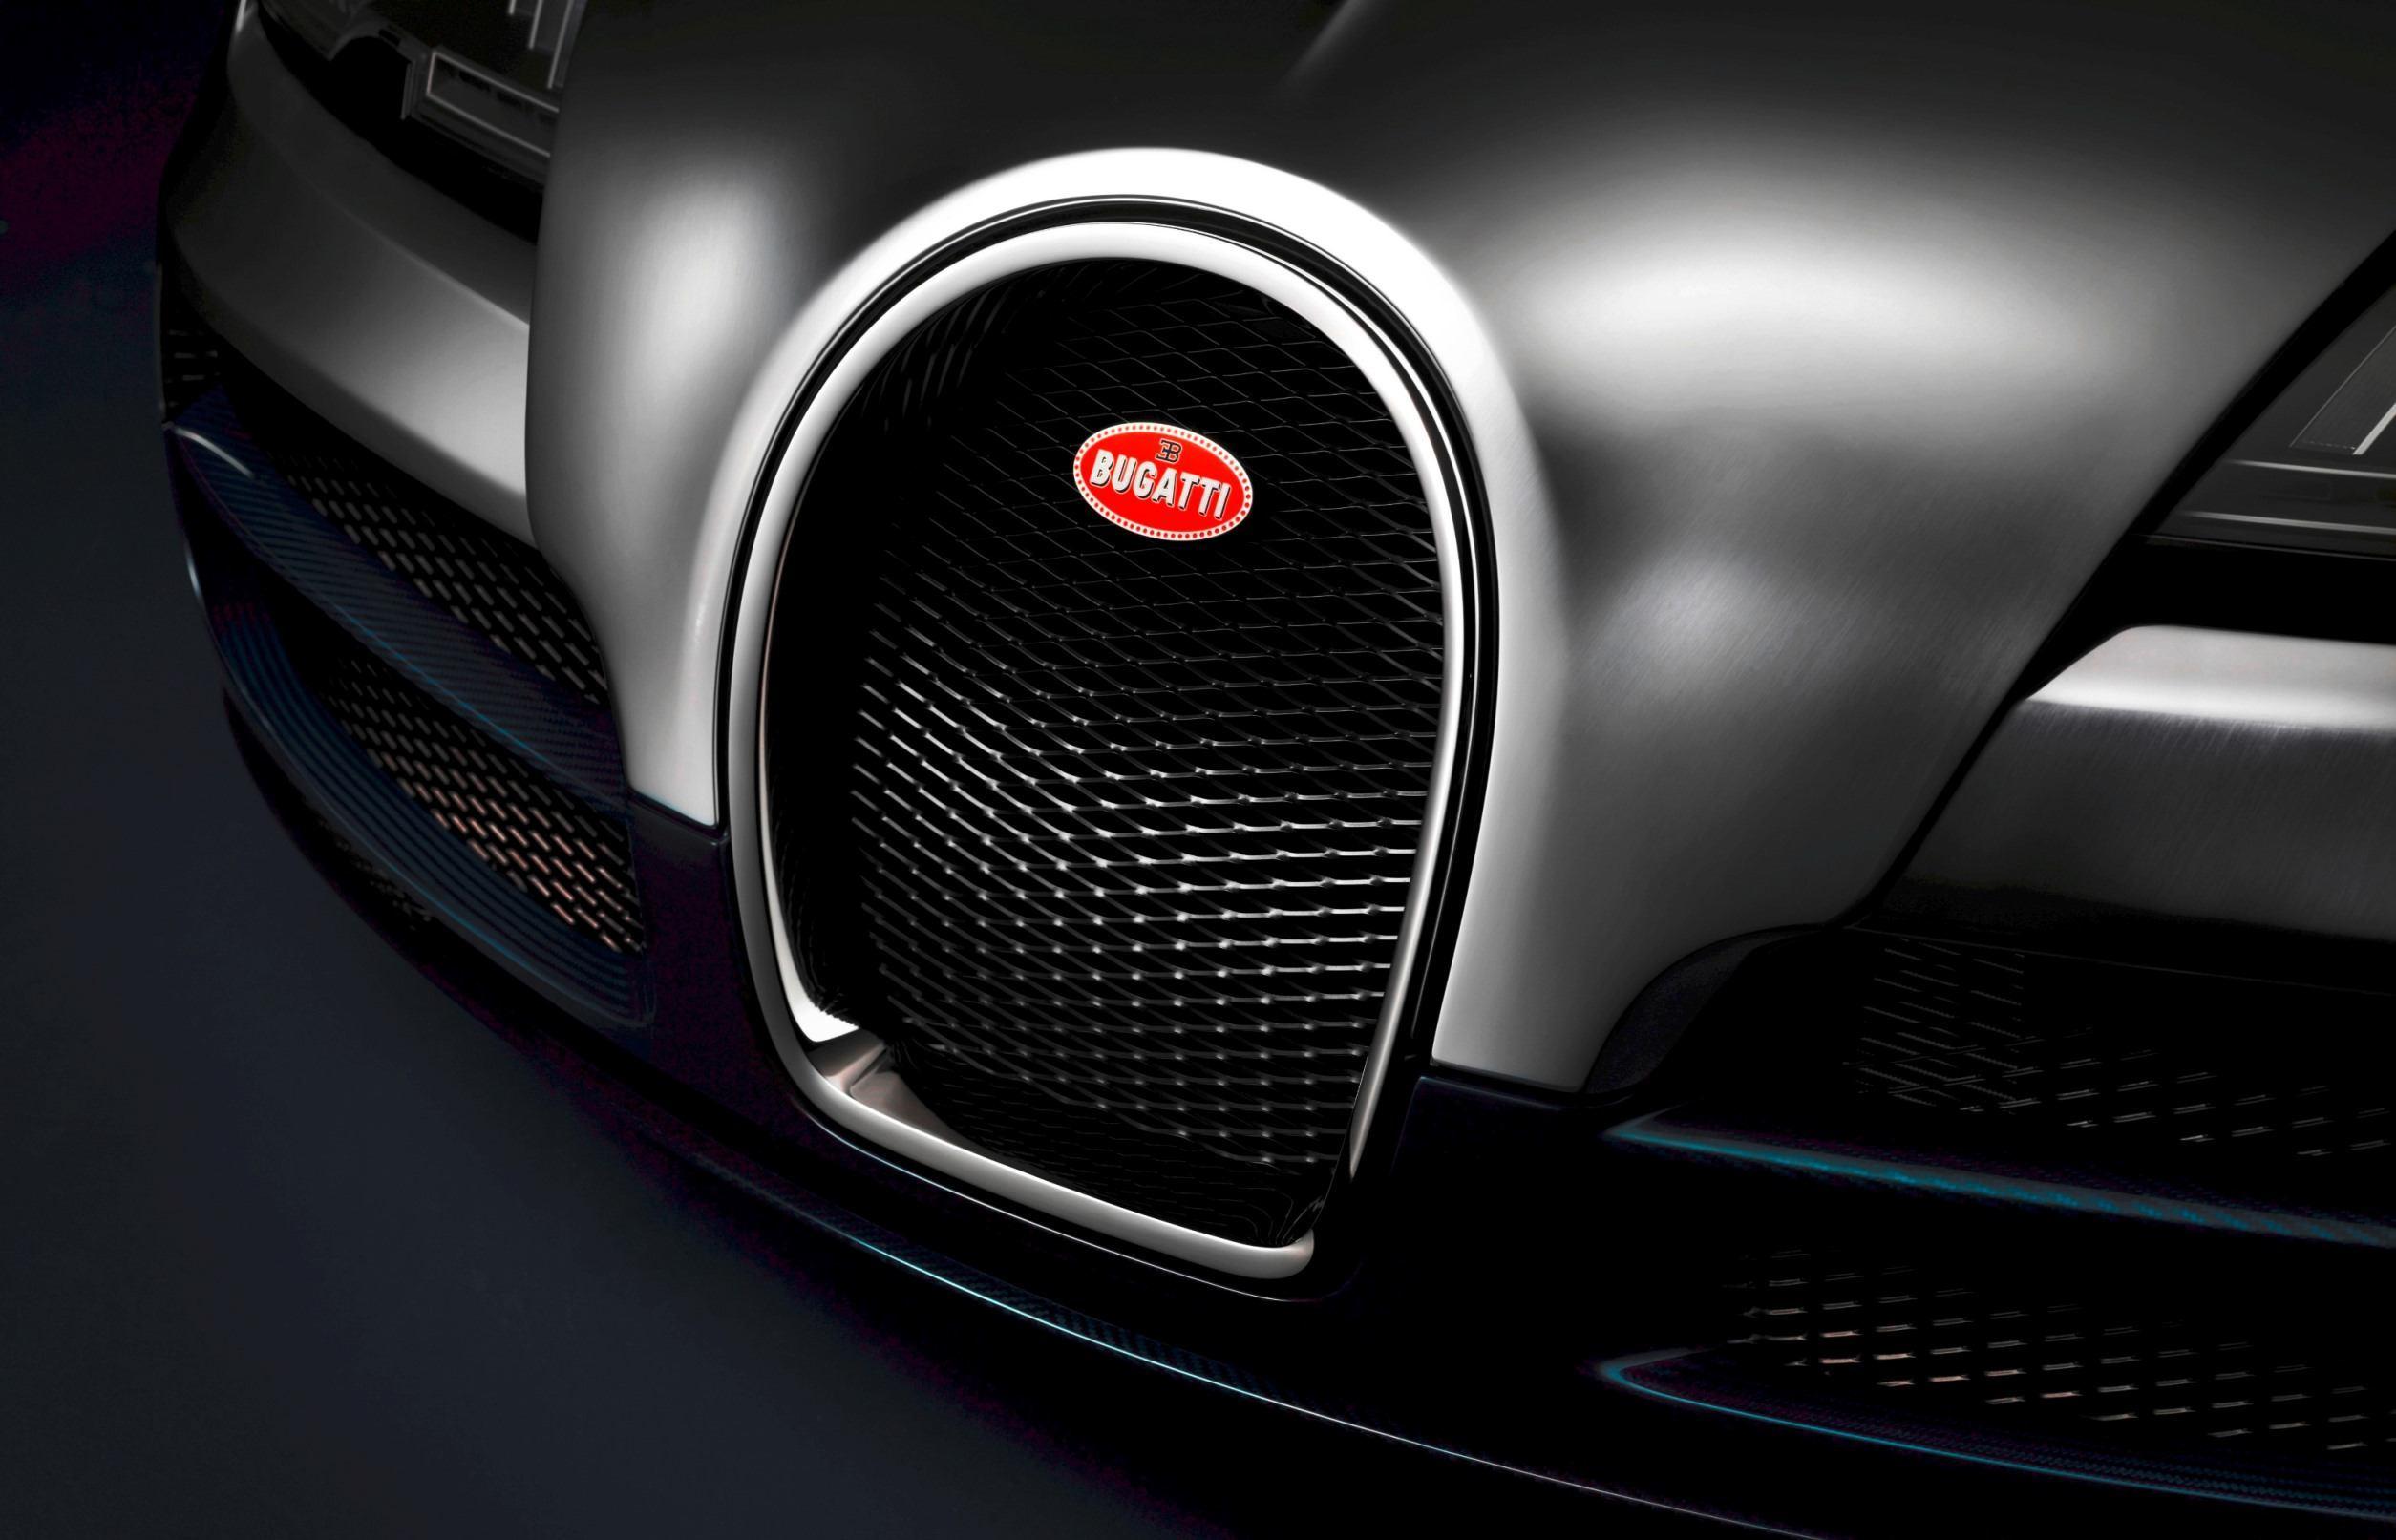 005_Legend_Ettore_Bugatti_Platinum_Horseshoe